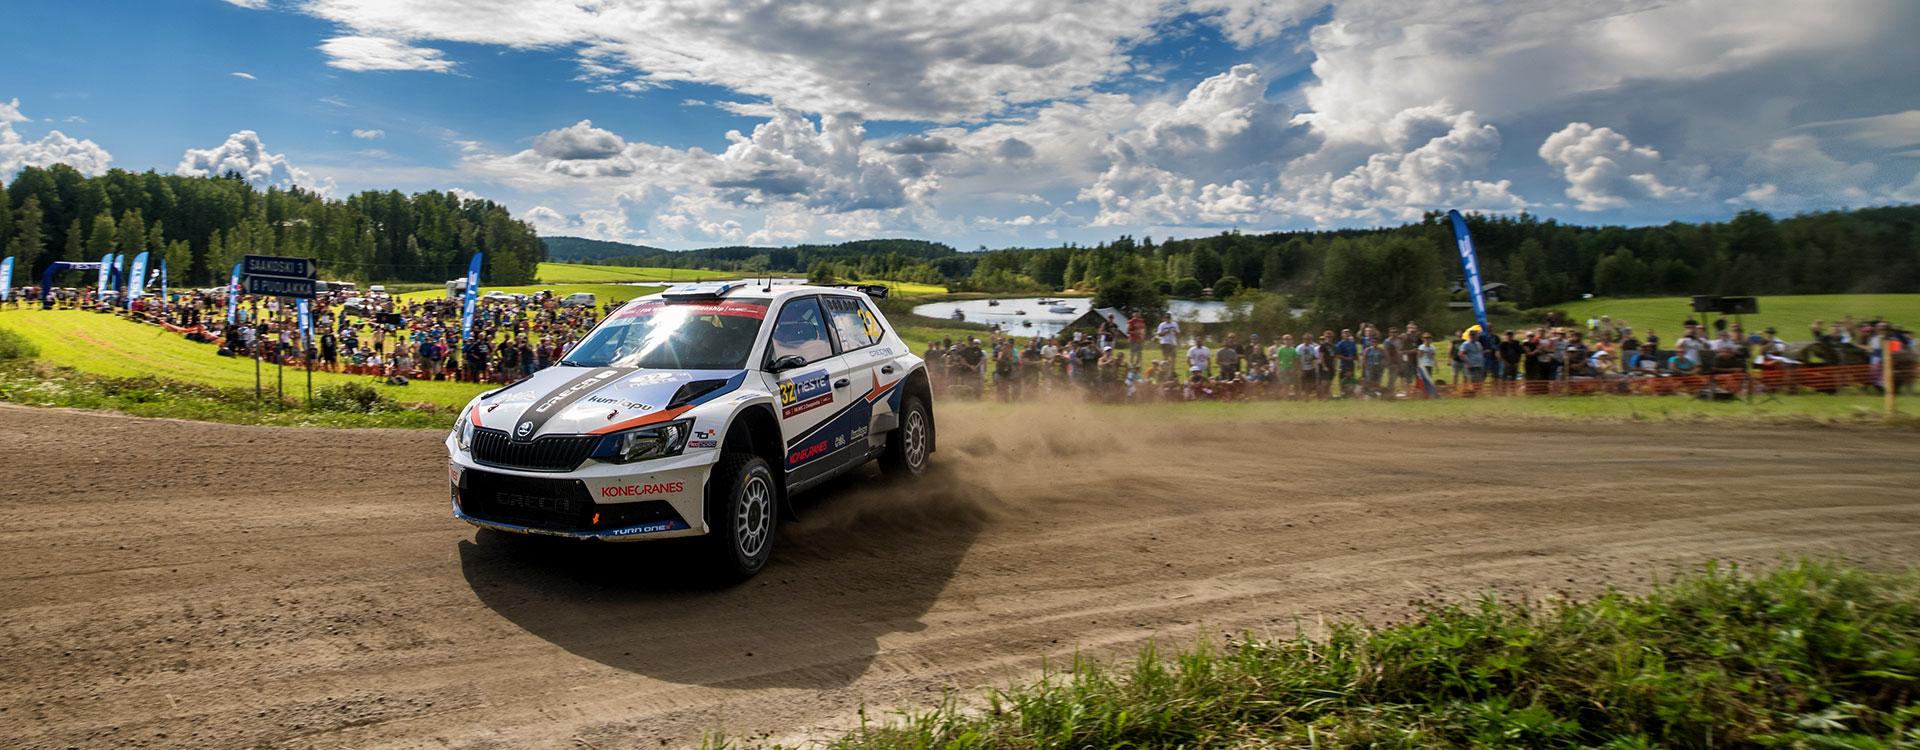 WRC Finland: Teemu Suninen closes on WRC2 championship leader